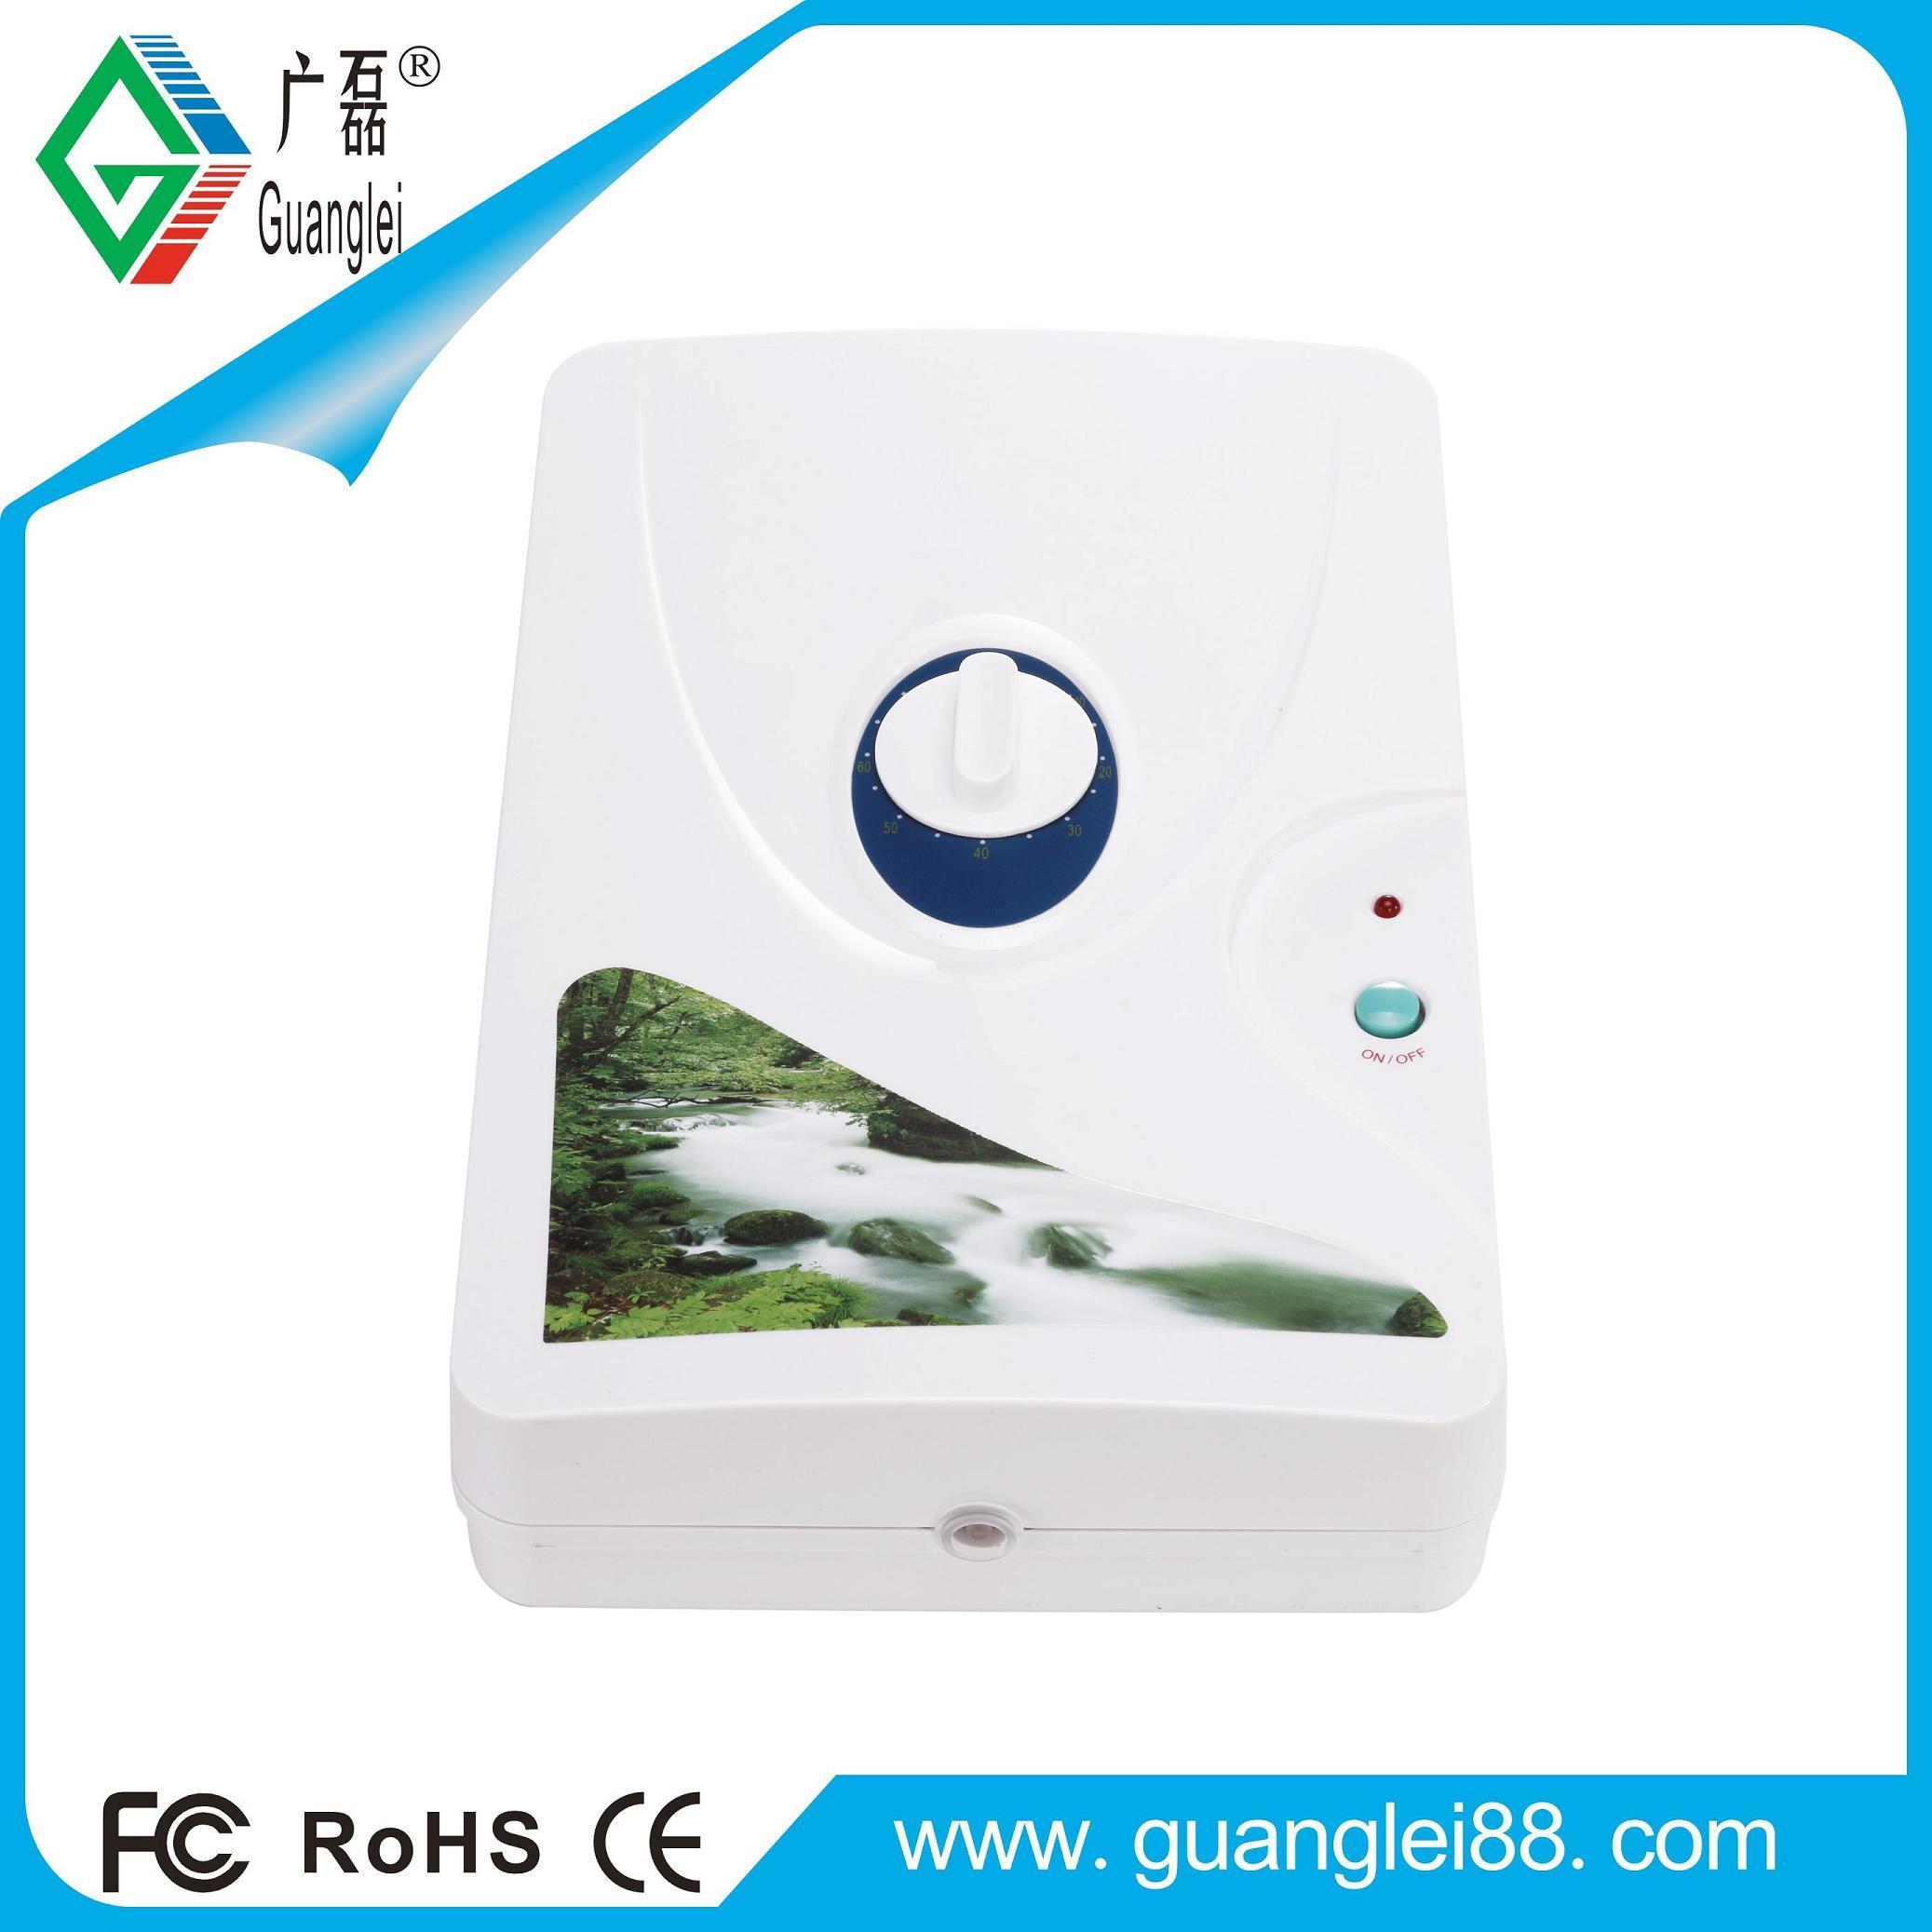 Fruit and Vegetable Ozone Washer (GL-3189)